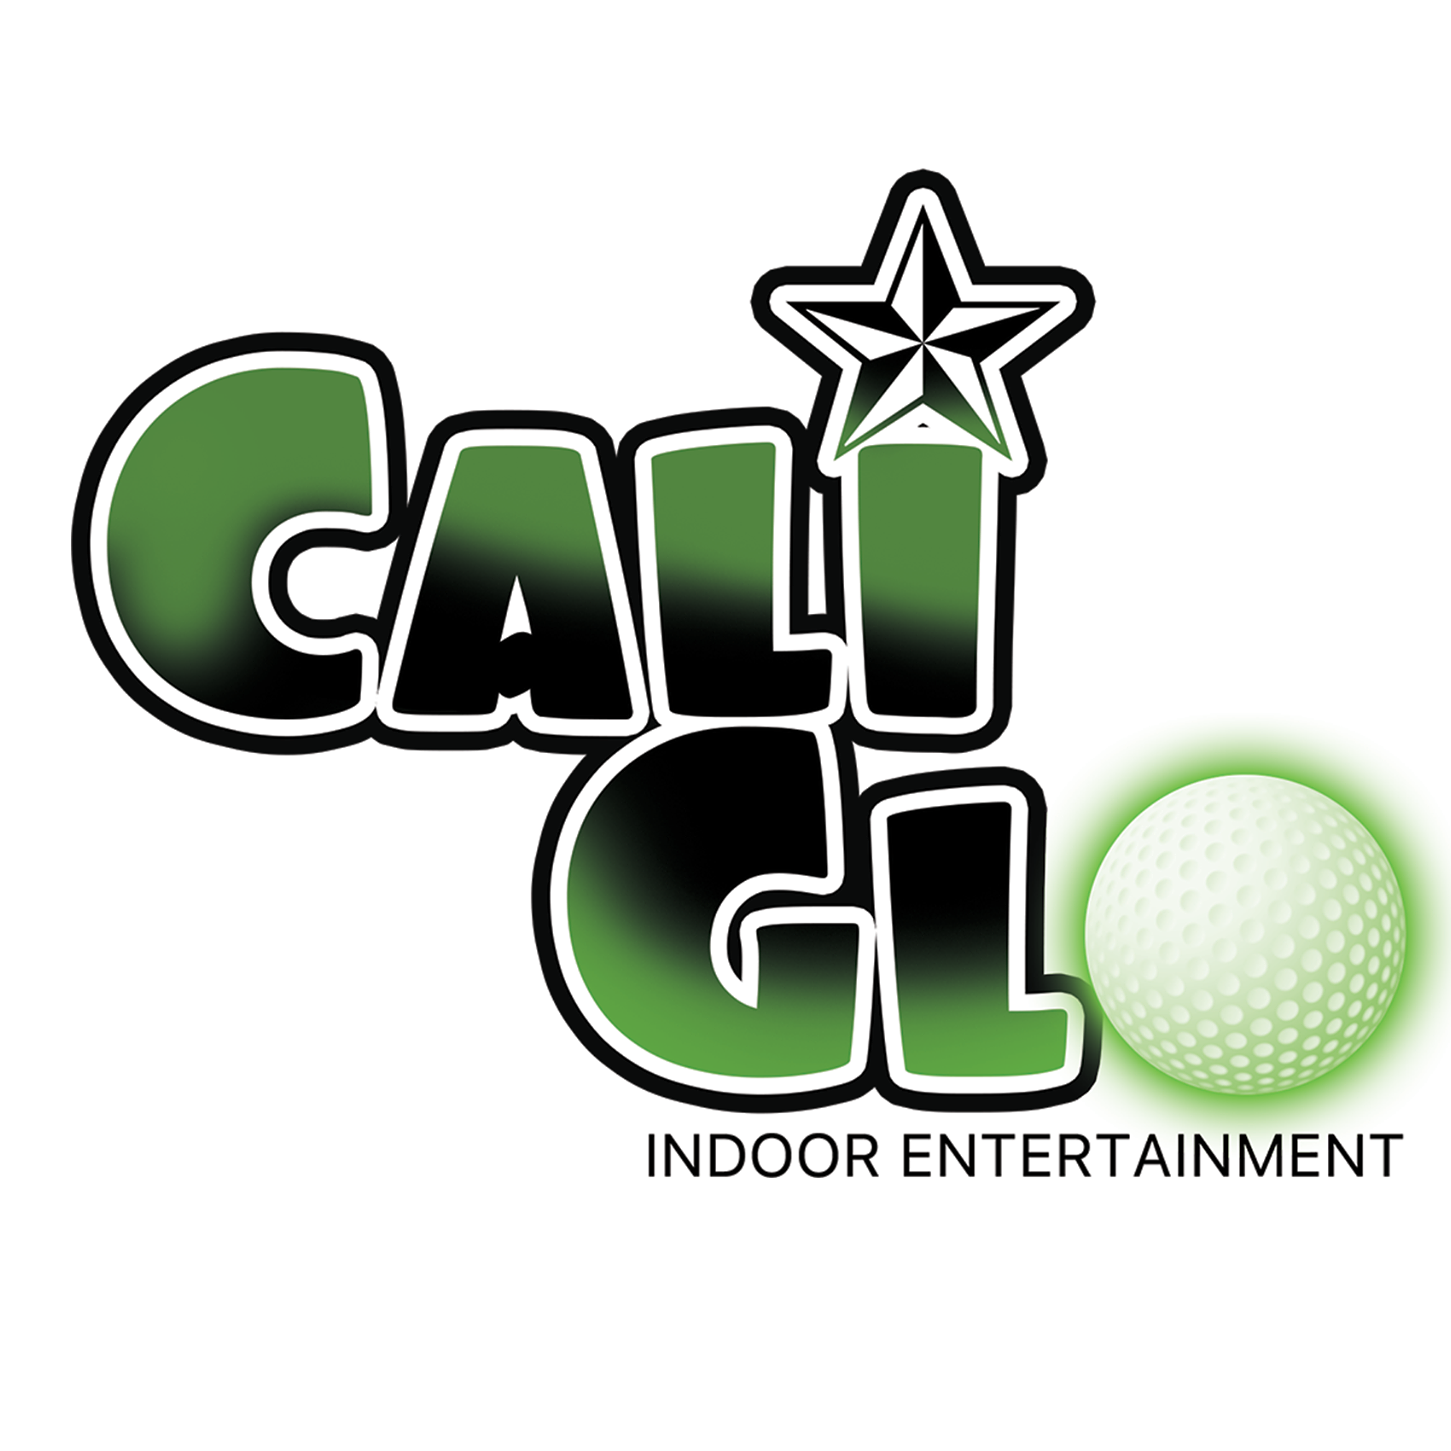 Cali Glo Indoor Entertainment